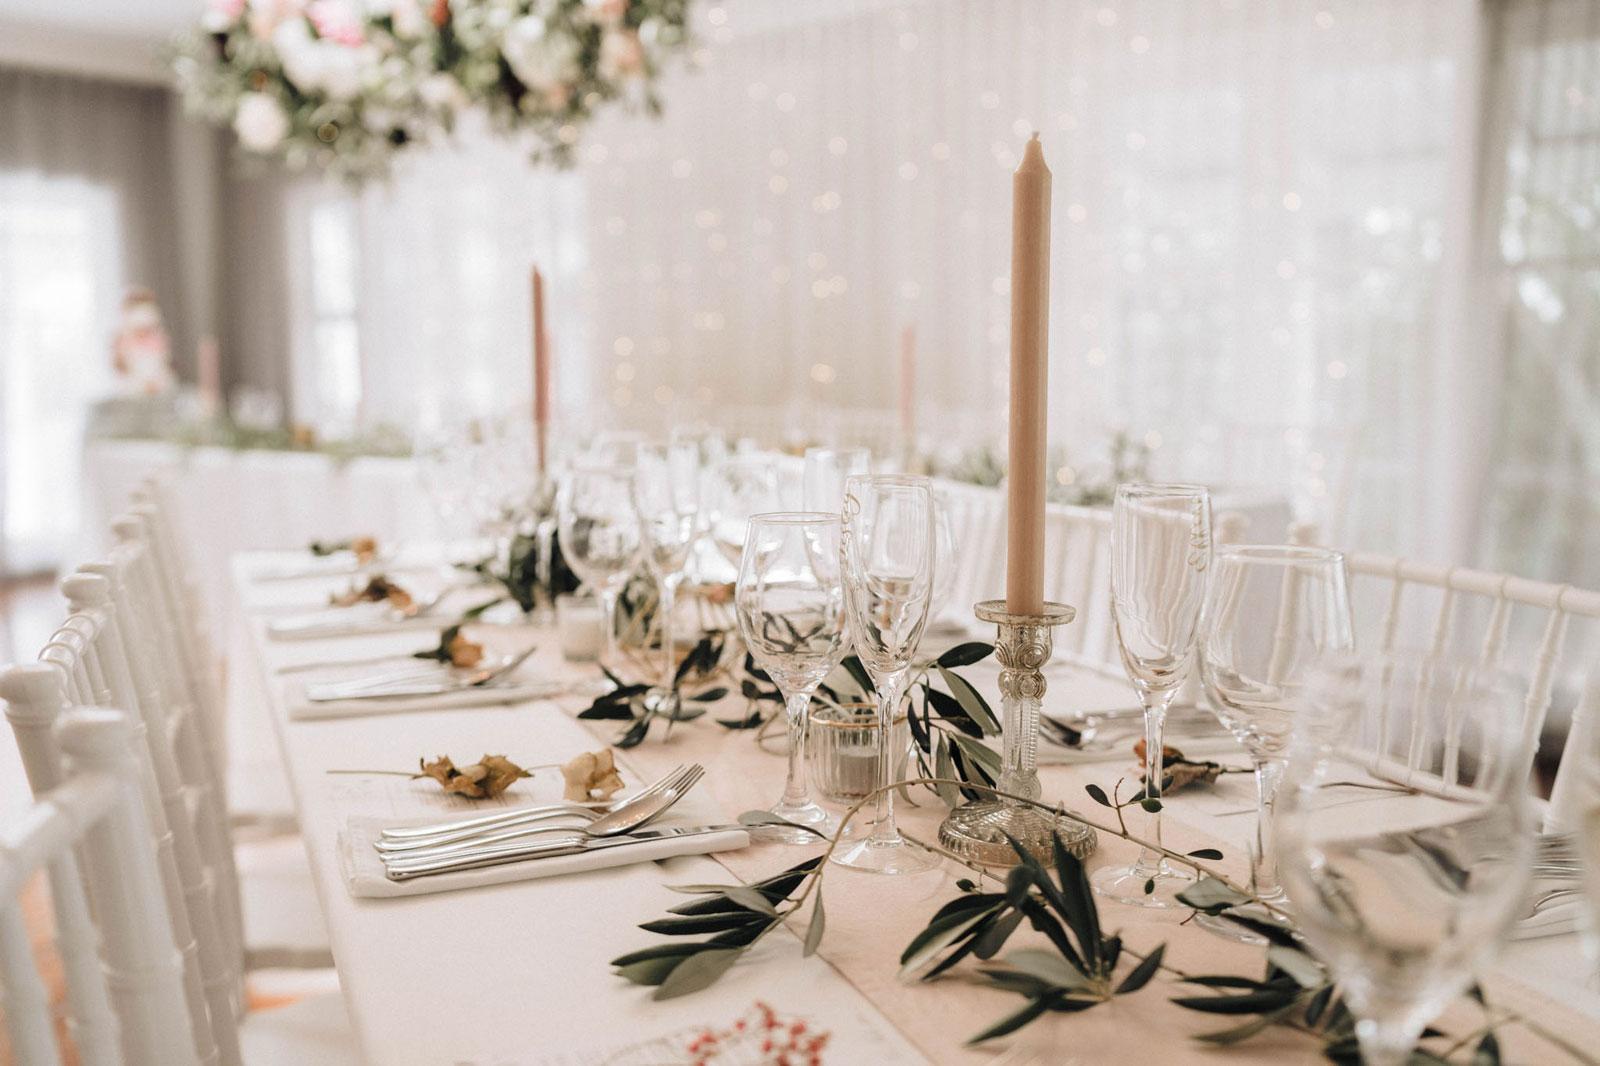 newfound-n-c-olive-tree-cottage-tauranga-wedding-photographer-920